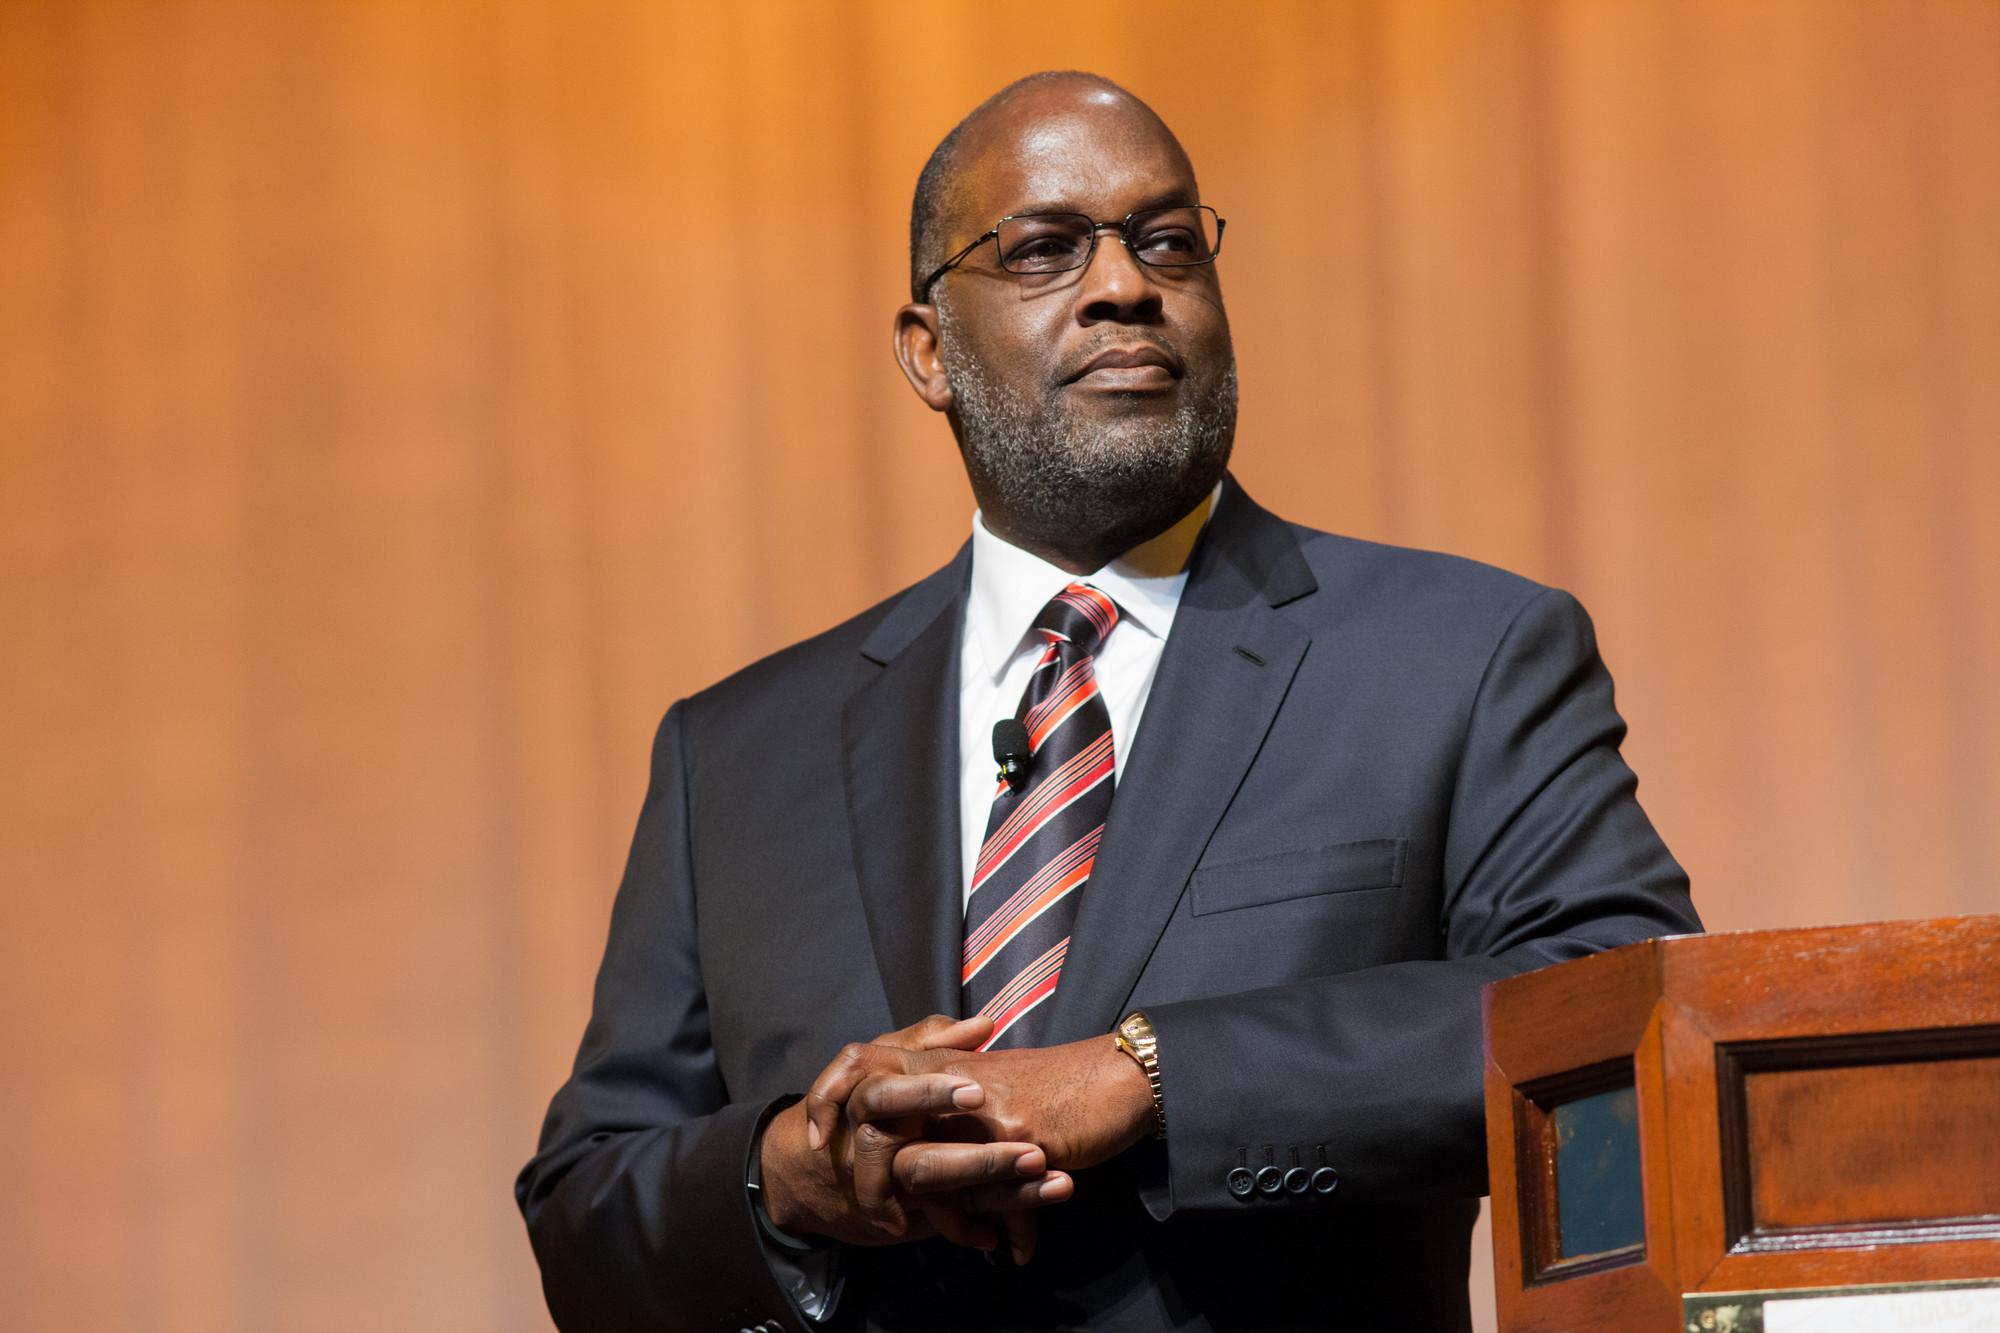 Kaiser Permanente CEO Bernard J. Tyson